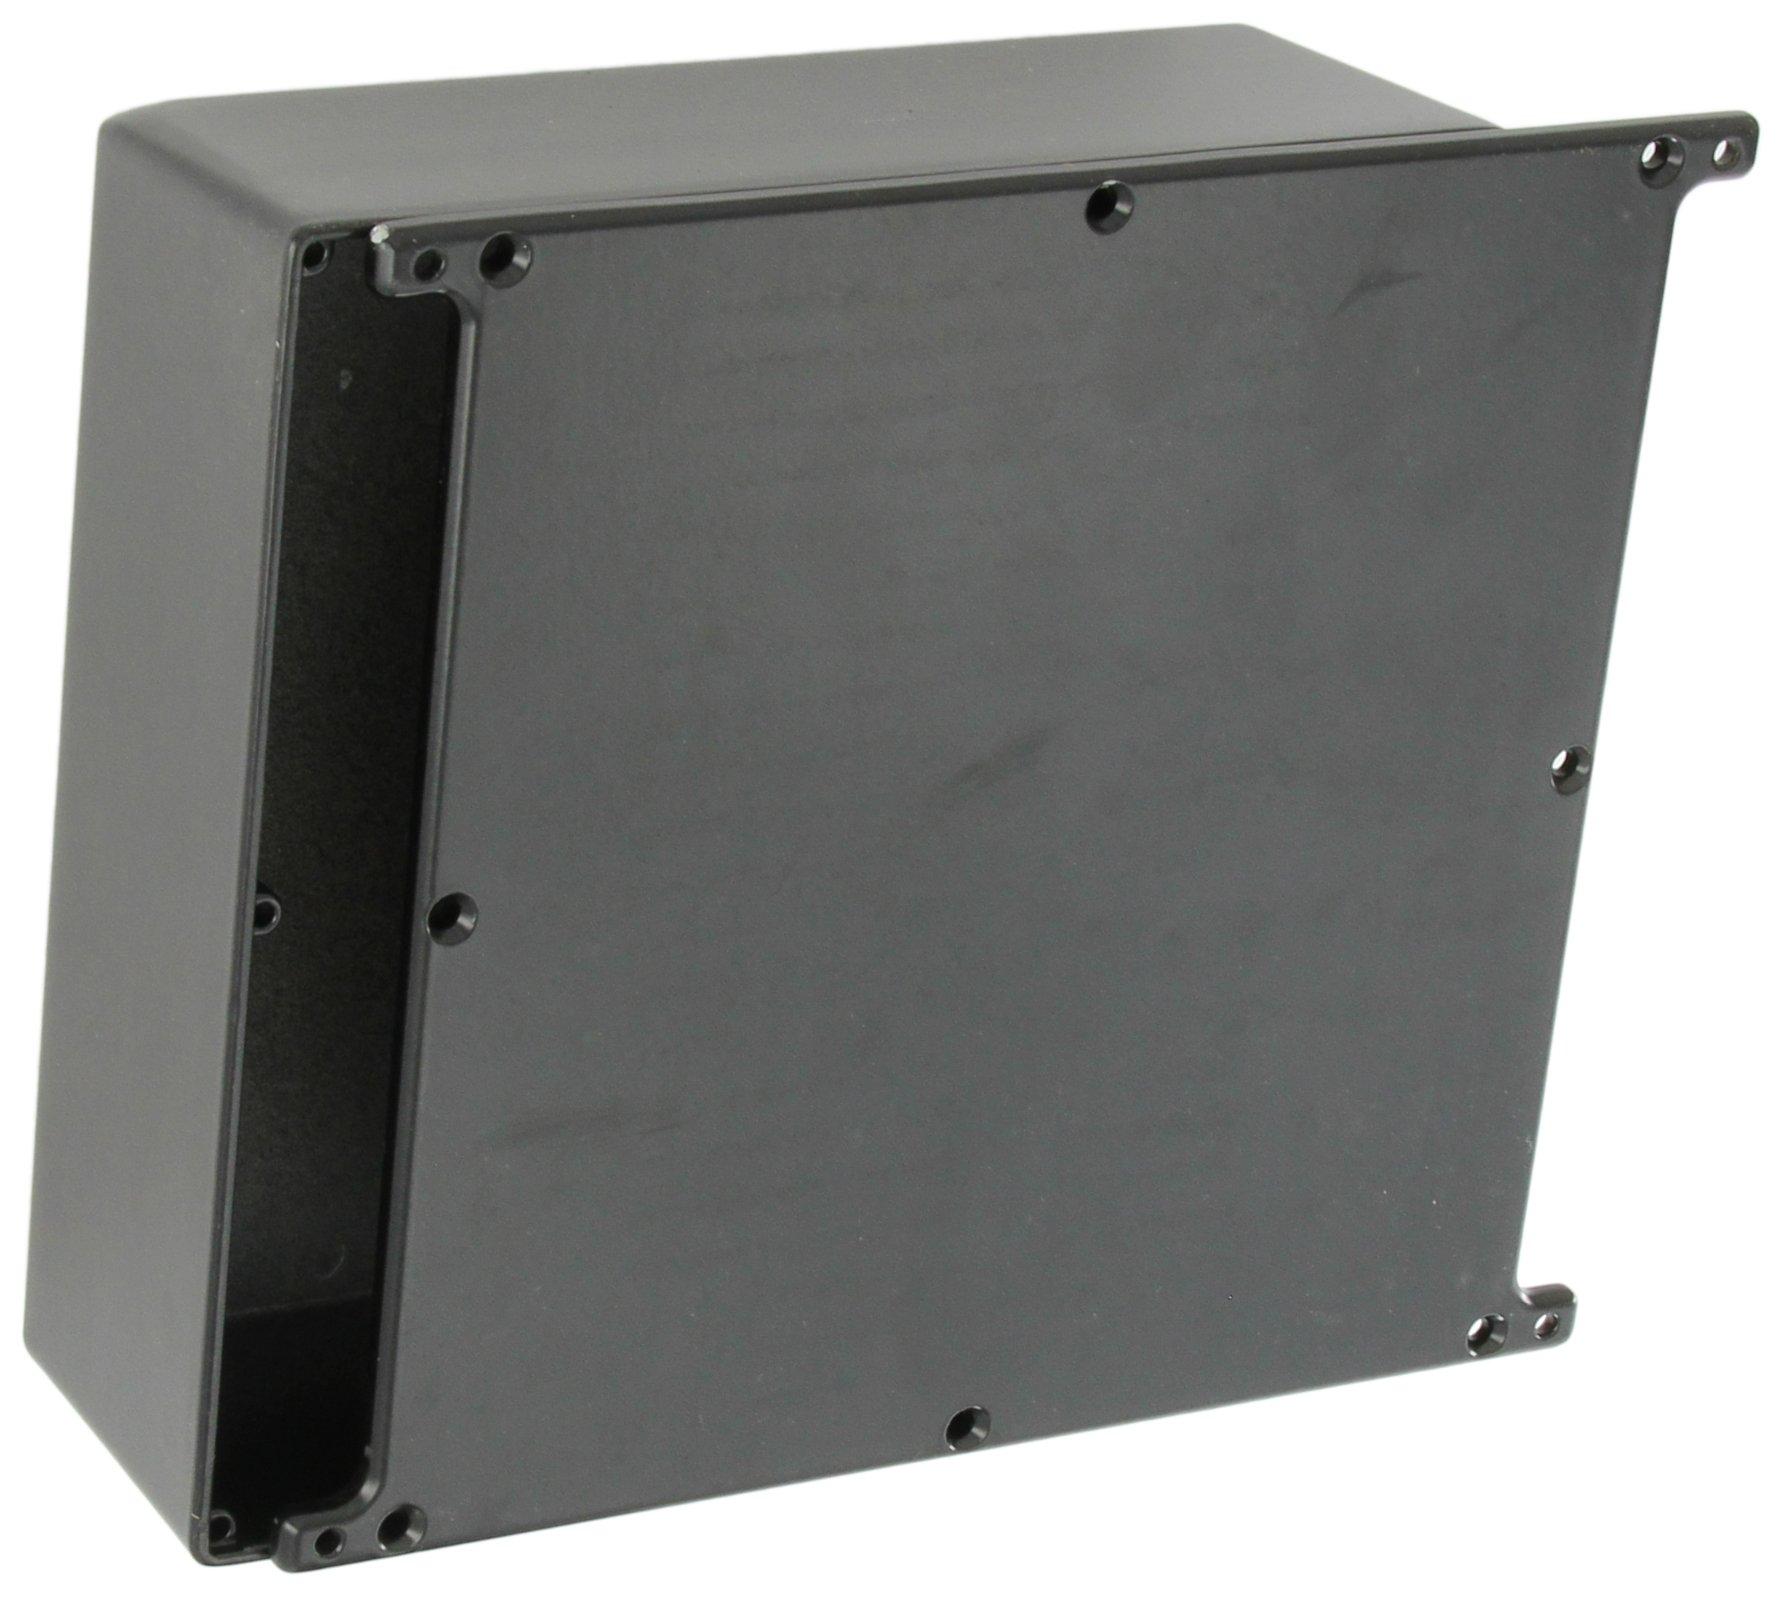 BUD Industries CU-5478-B Die Cast Aluminum Econobox with Mounting Bracket Cover, 7-1/2'' Length x 7-1/2'' Width x 2-39/64'' Height, Black Powdercoat Finish